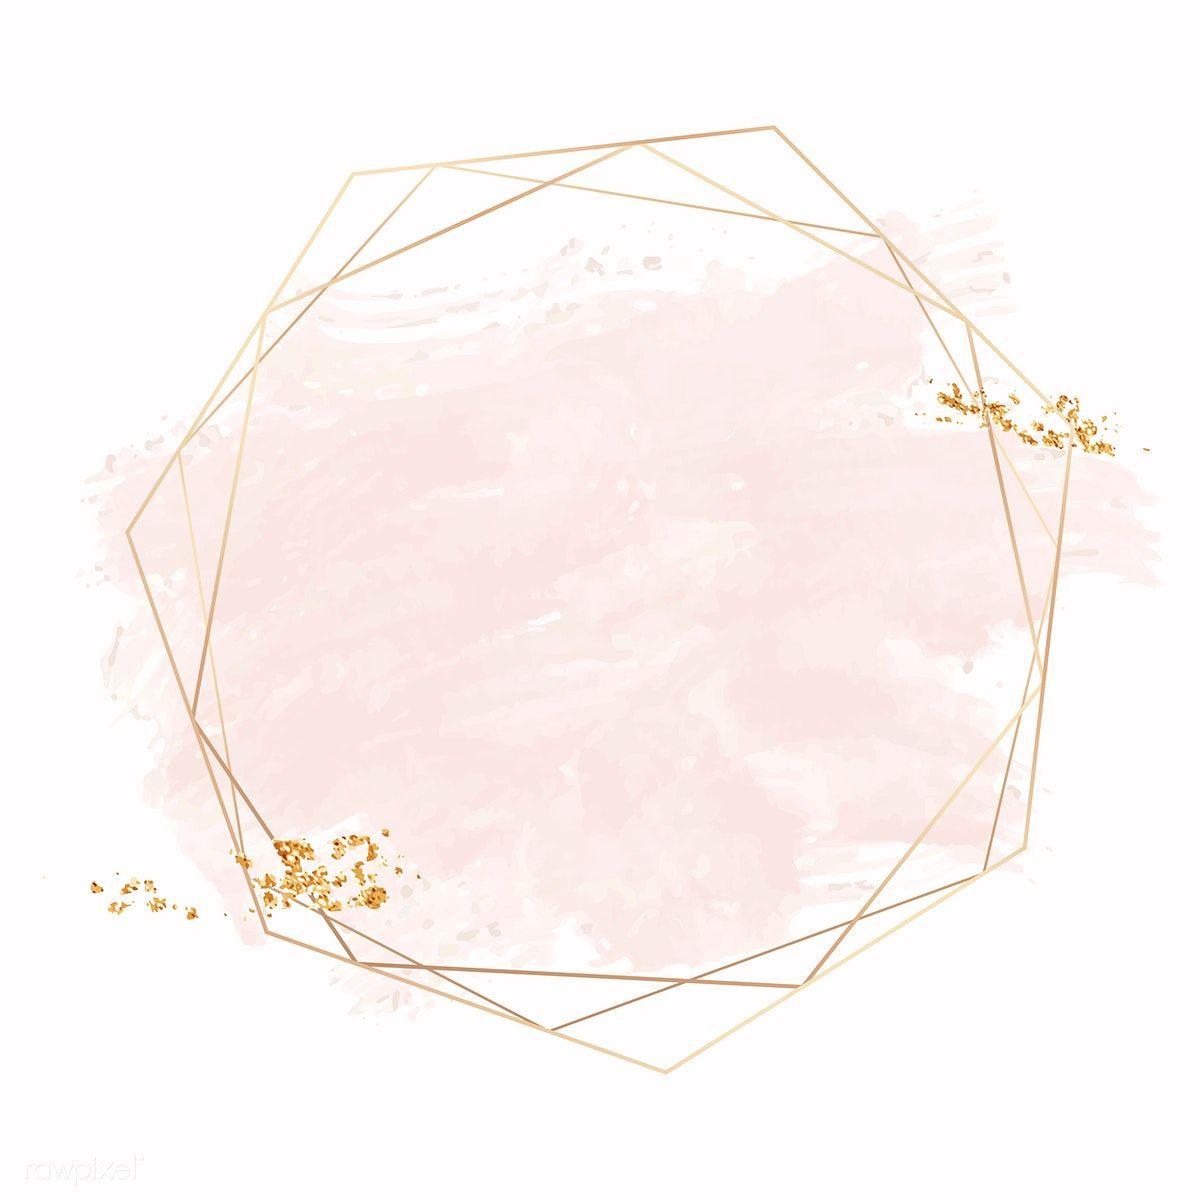 Gold Geometric Frame On A Pink Brushstroke Background